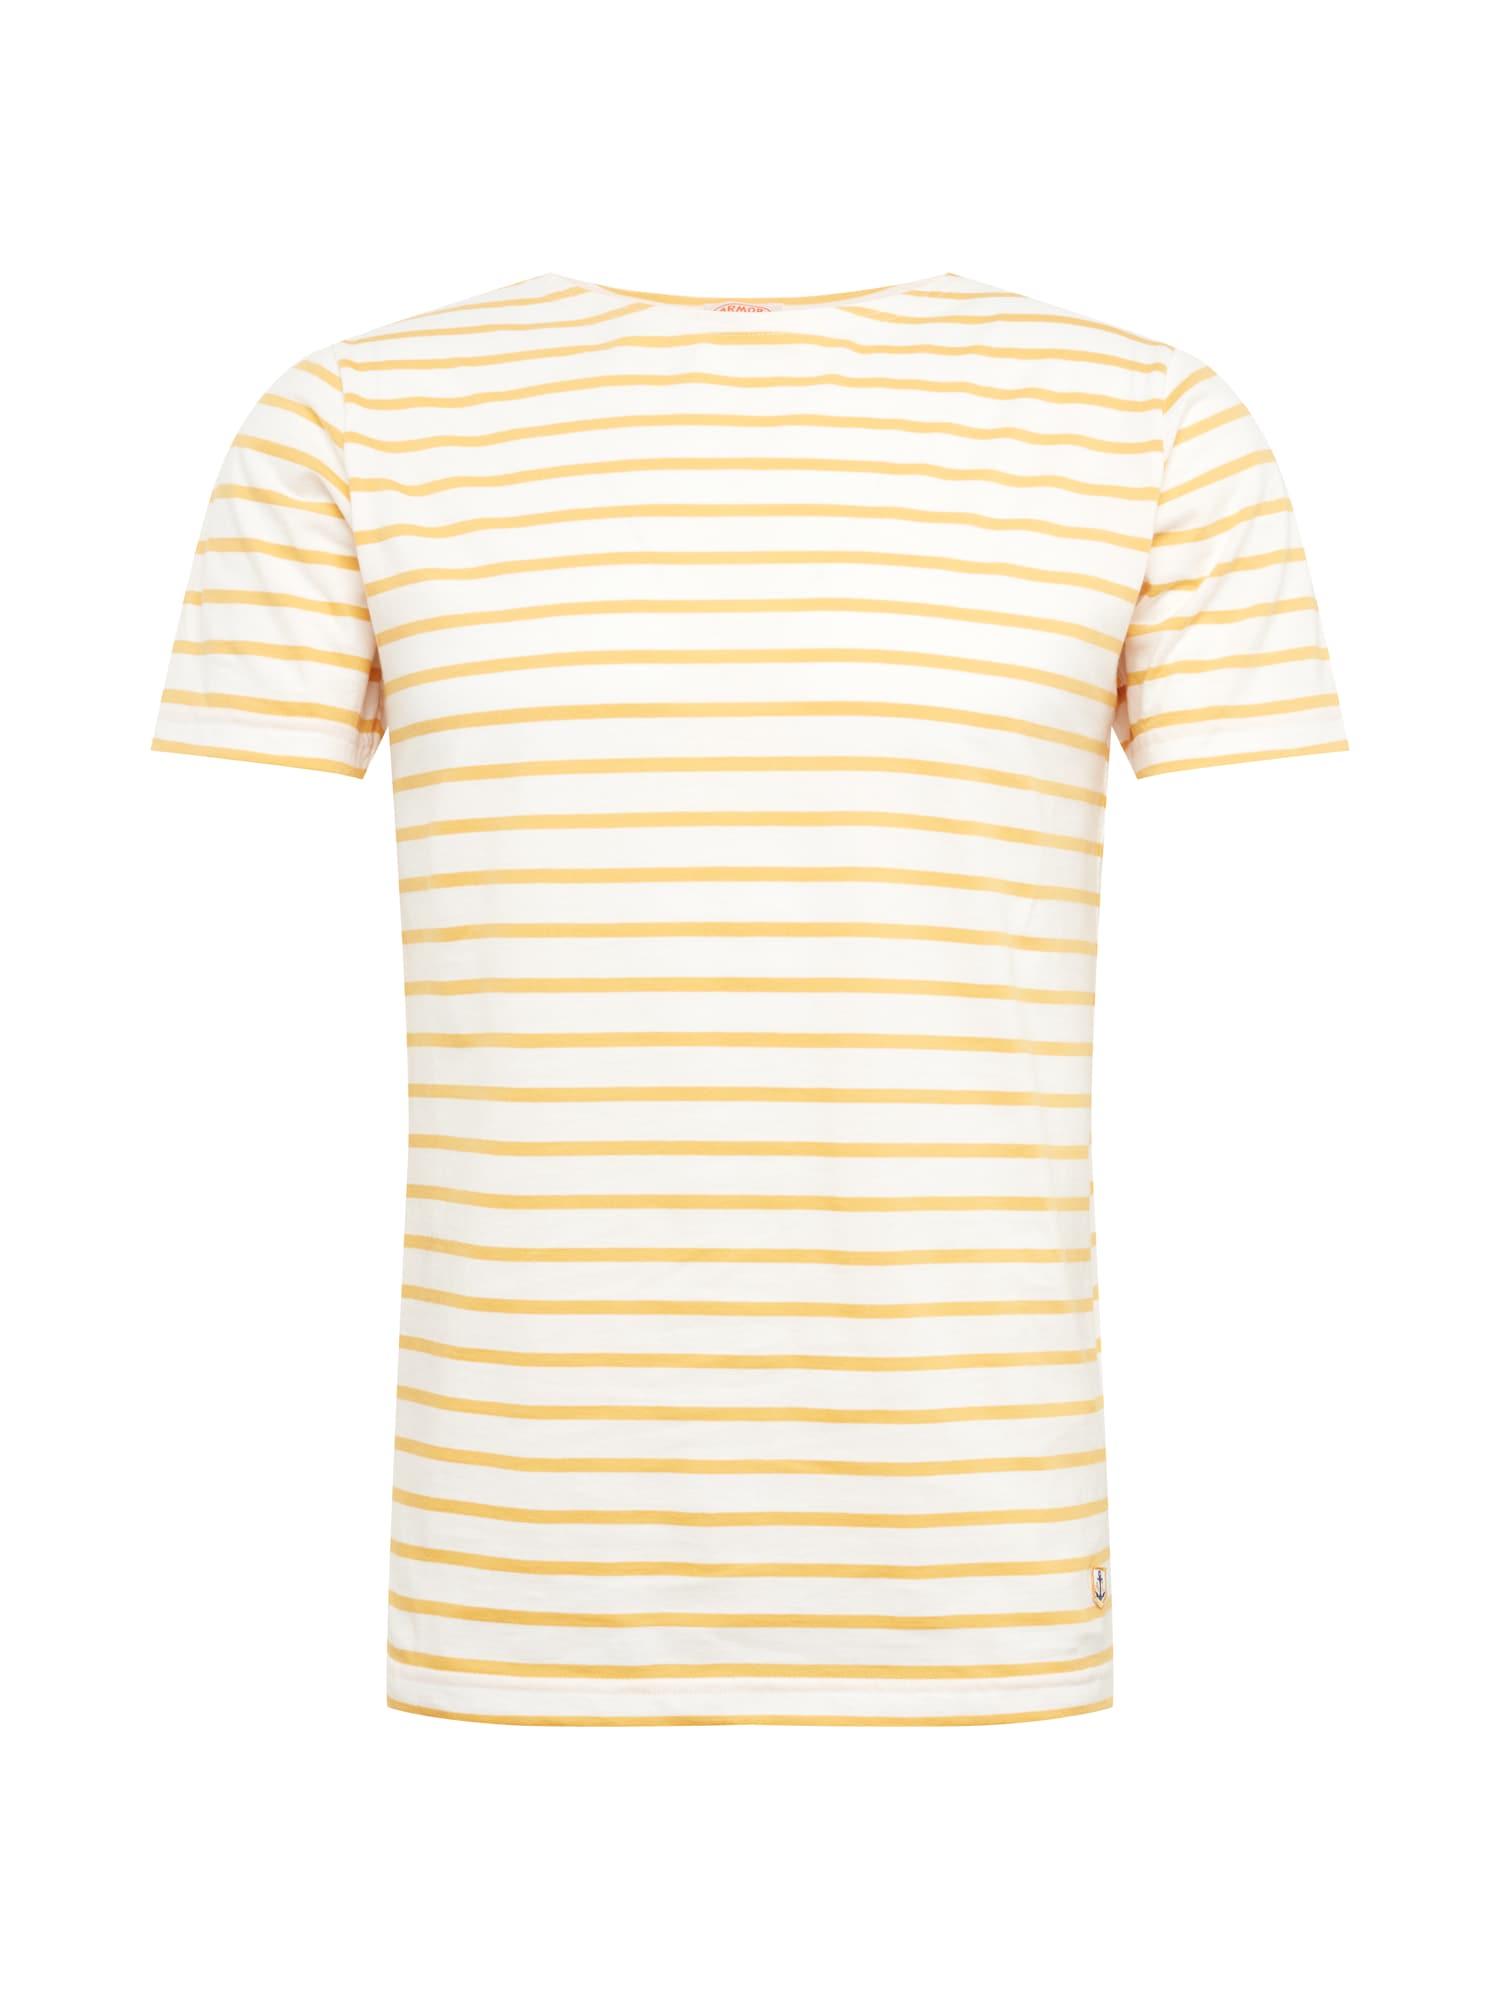 Tričko Marinière žlutá přírodní bílá Armor Lux